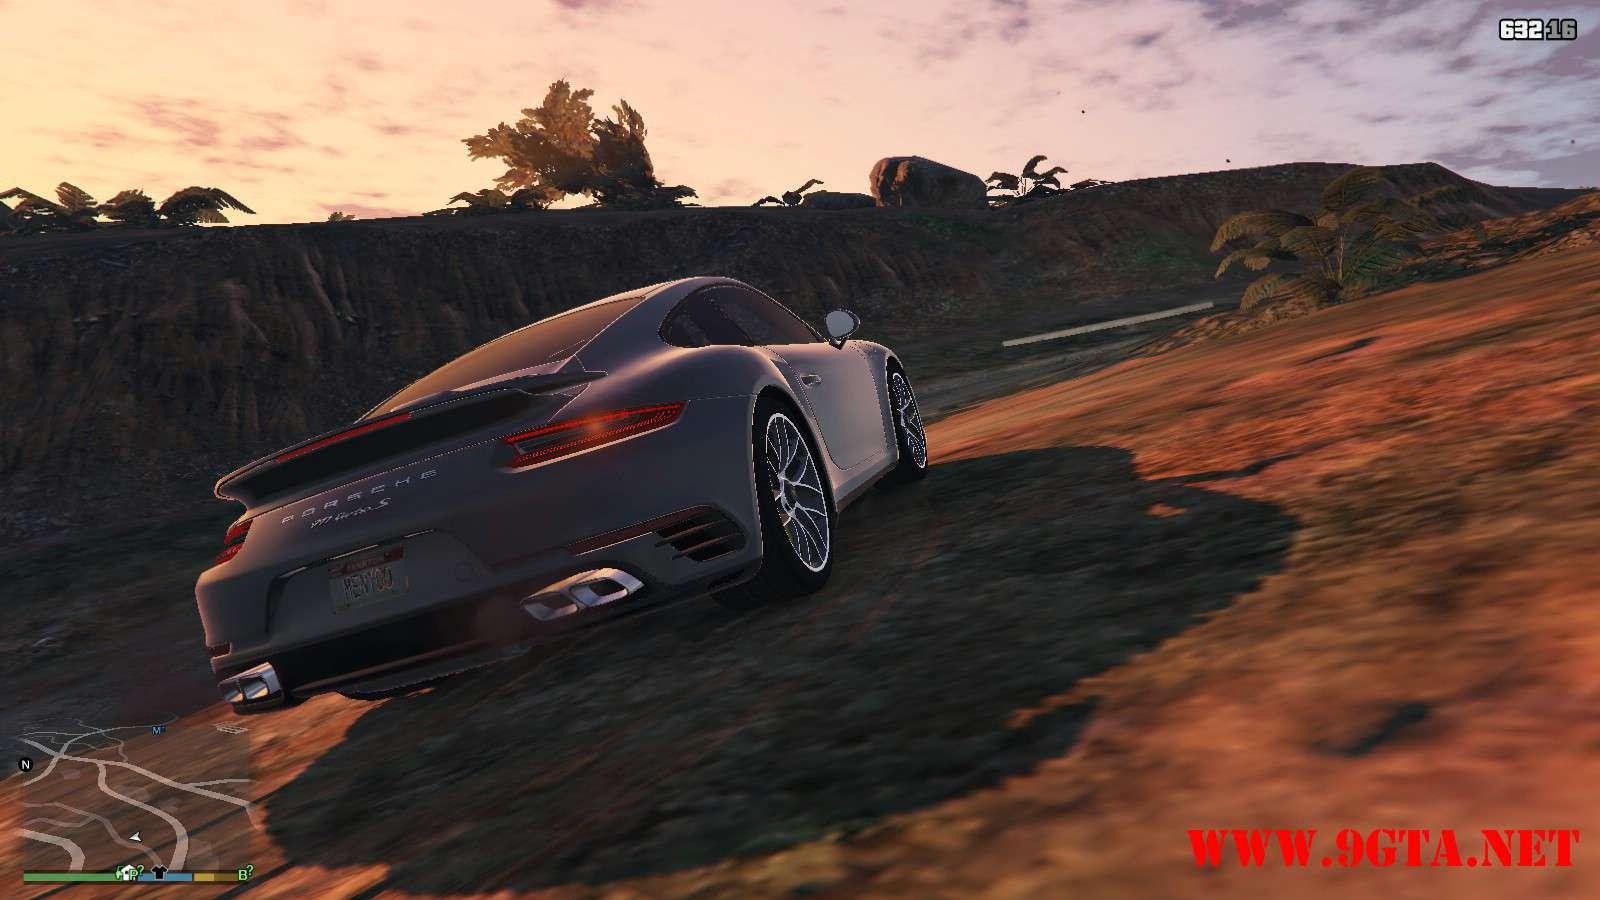 2016 Porsche 911 Turbo S GTA5 Mods (13)